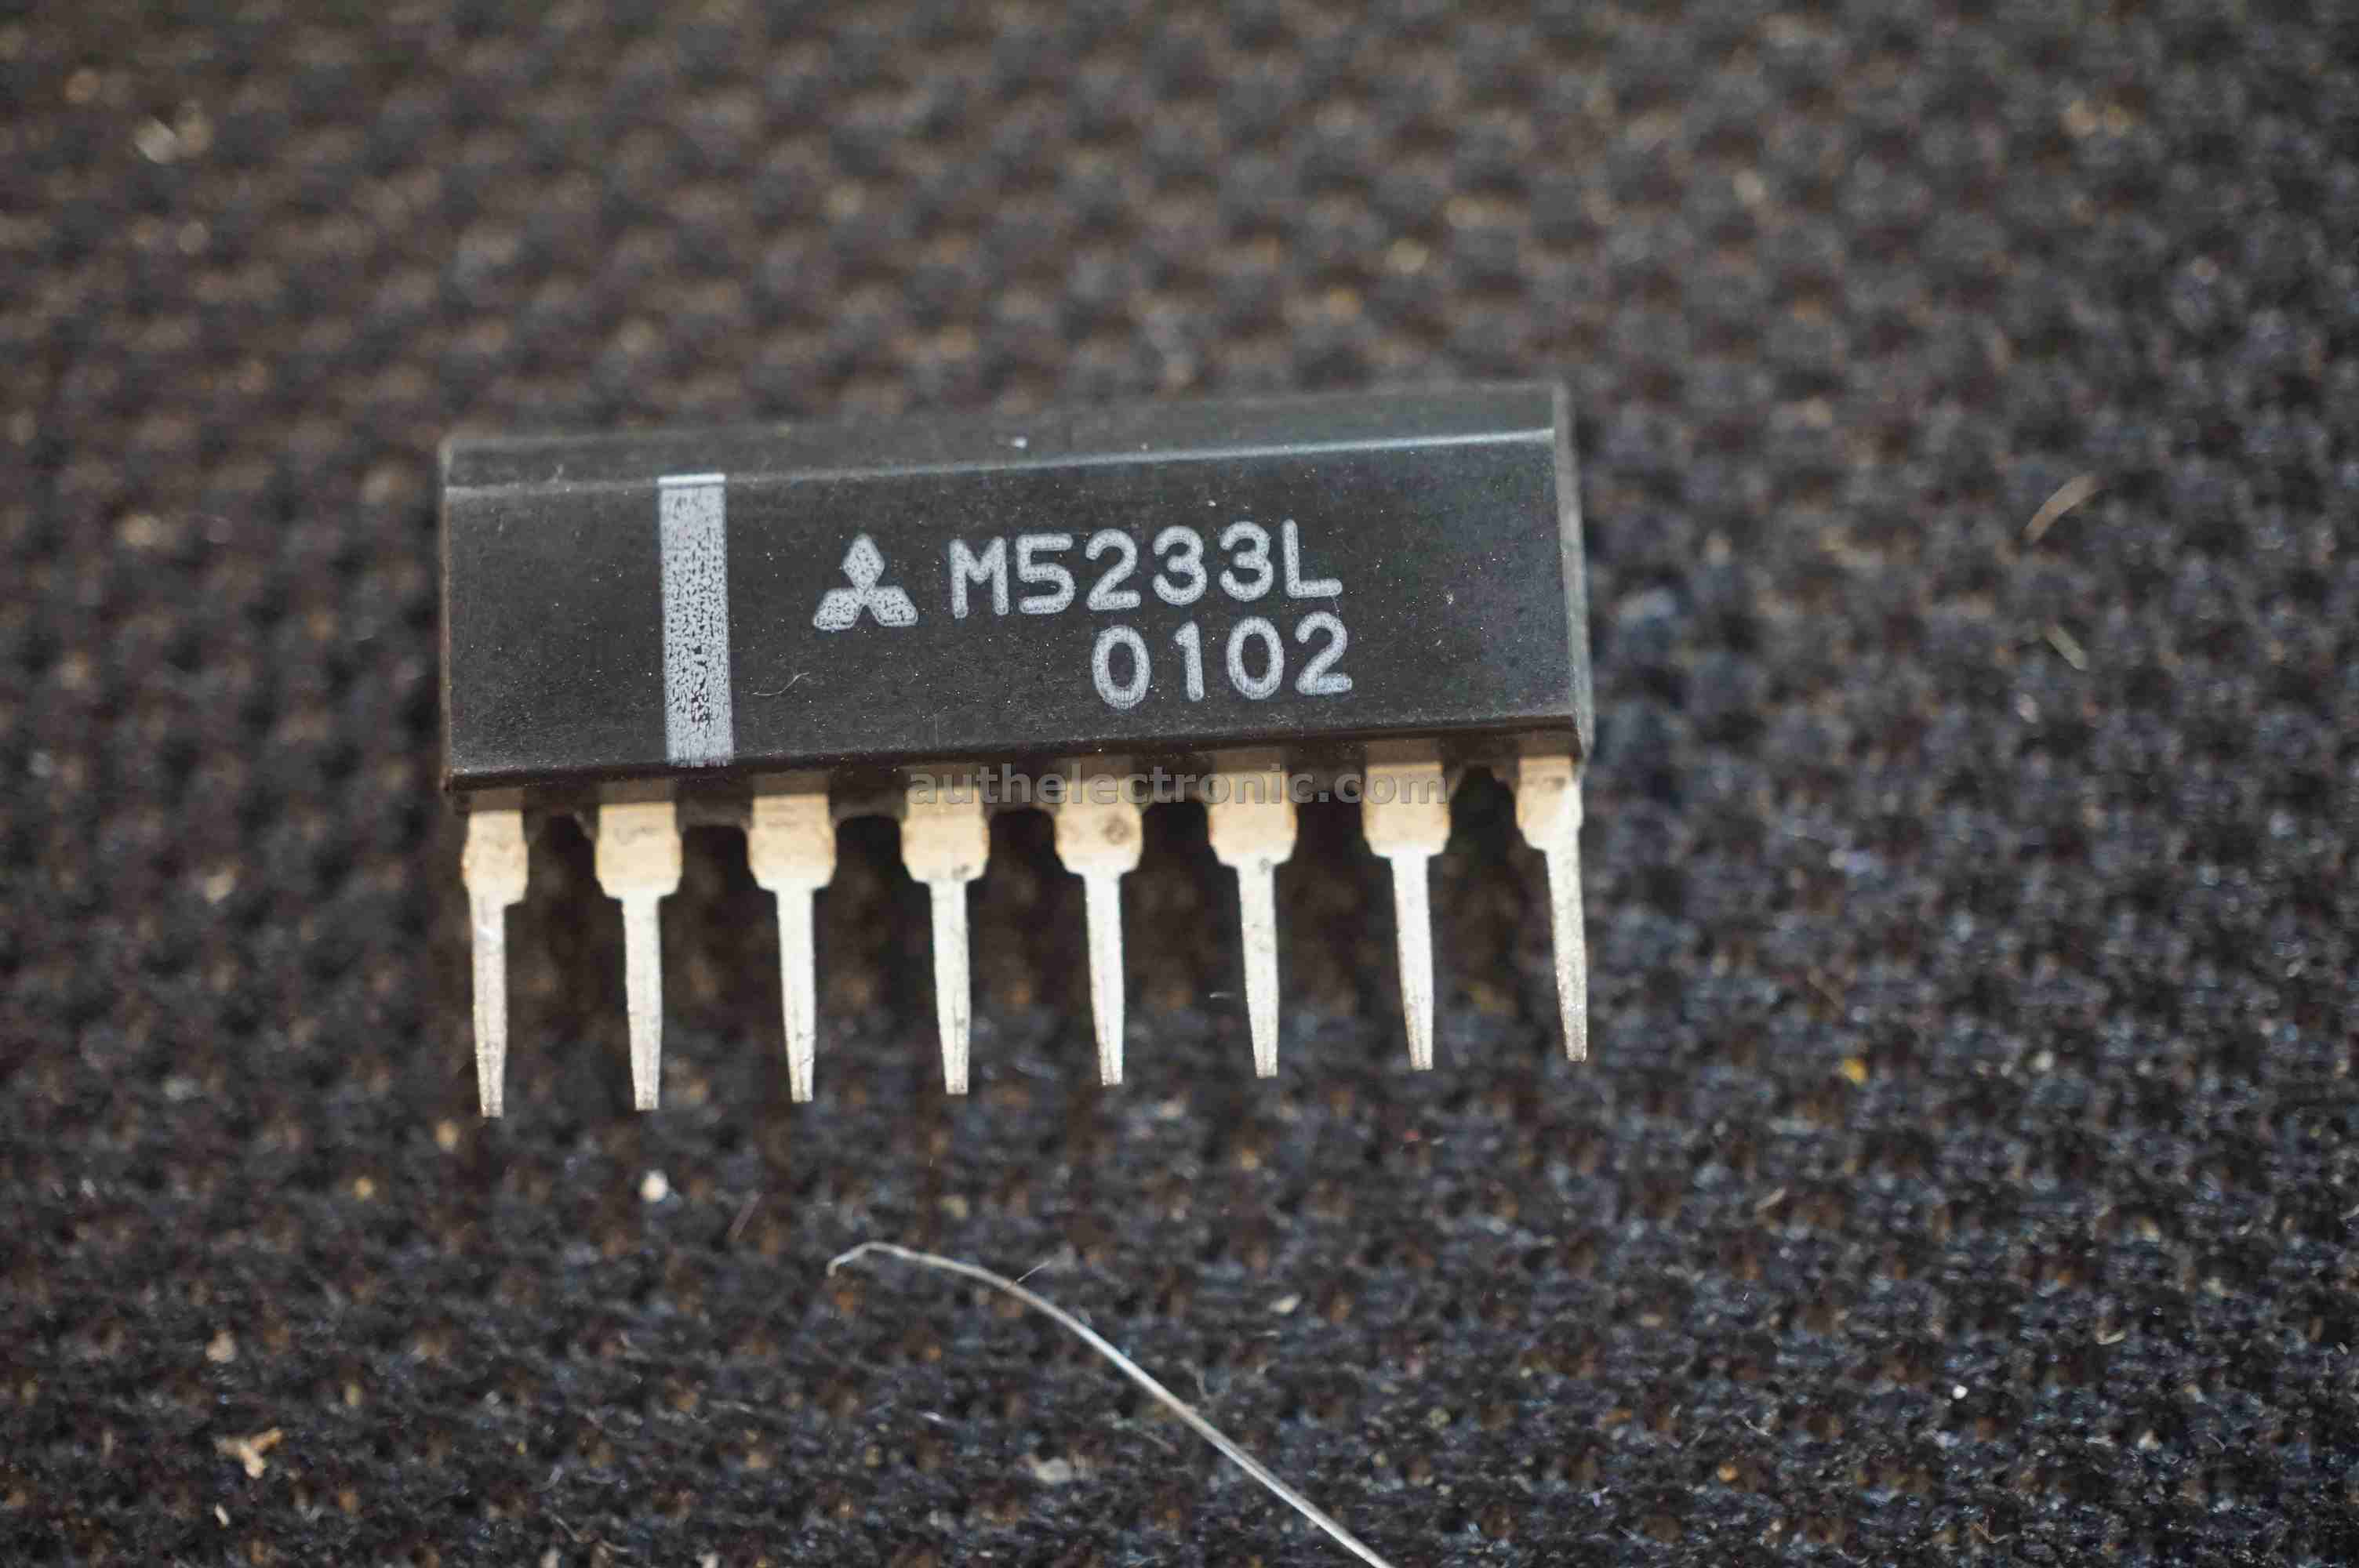 5pcs-original-dual-comparator-ic-m5233l-m5233-5233-sip-8-new-mitsubishi-electric